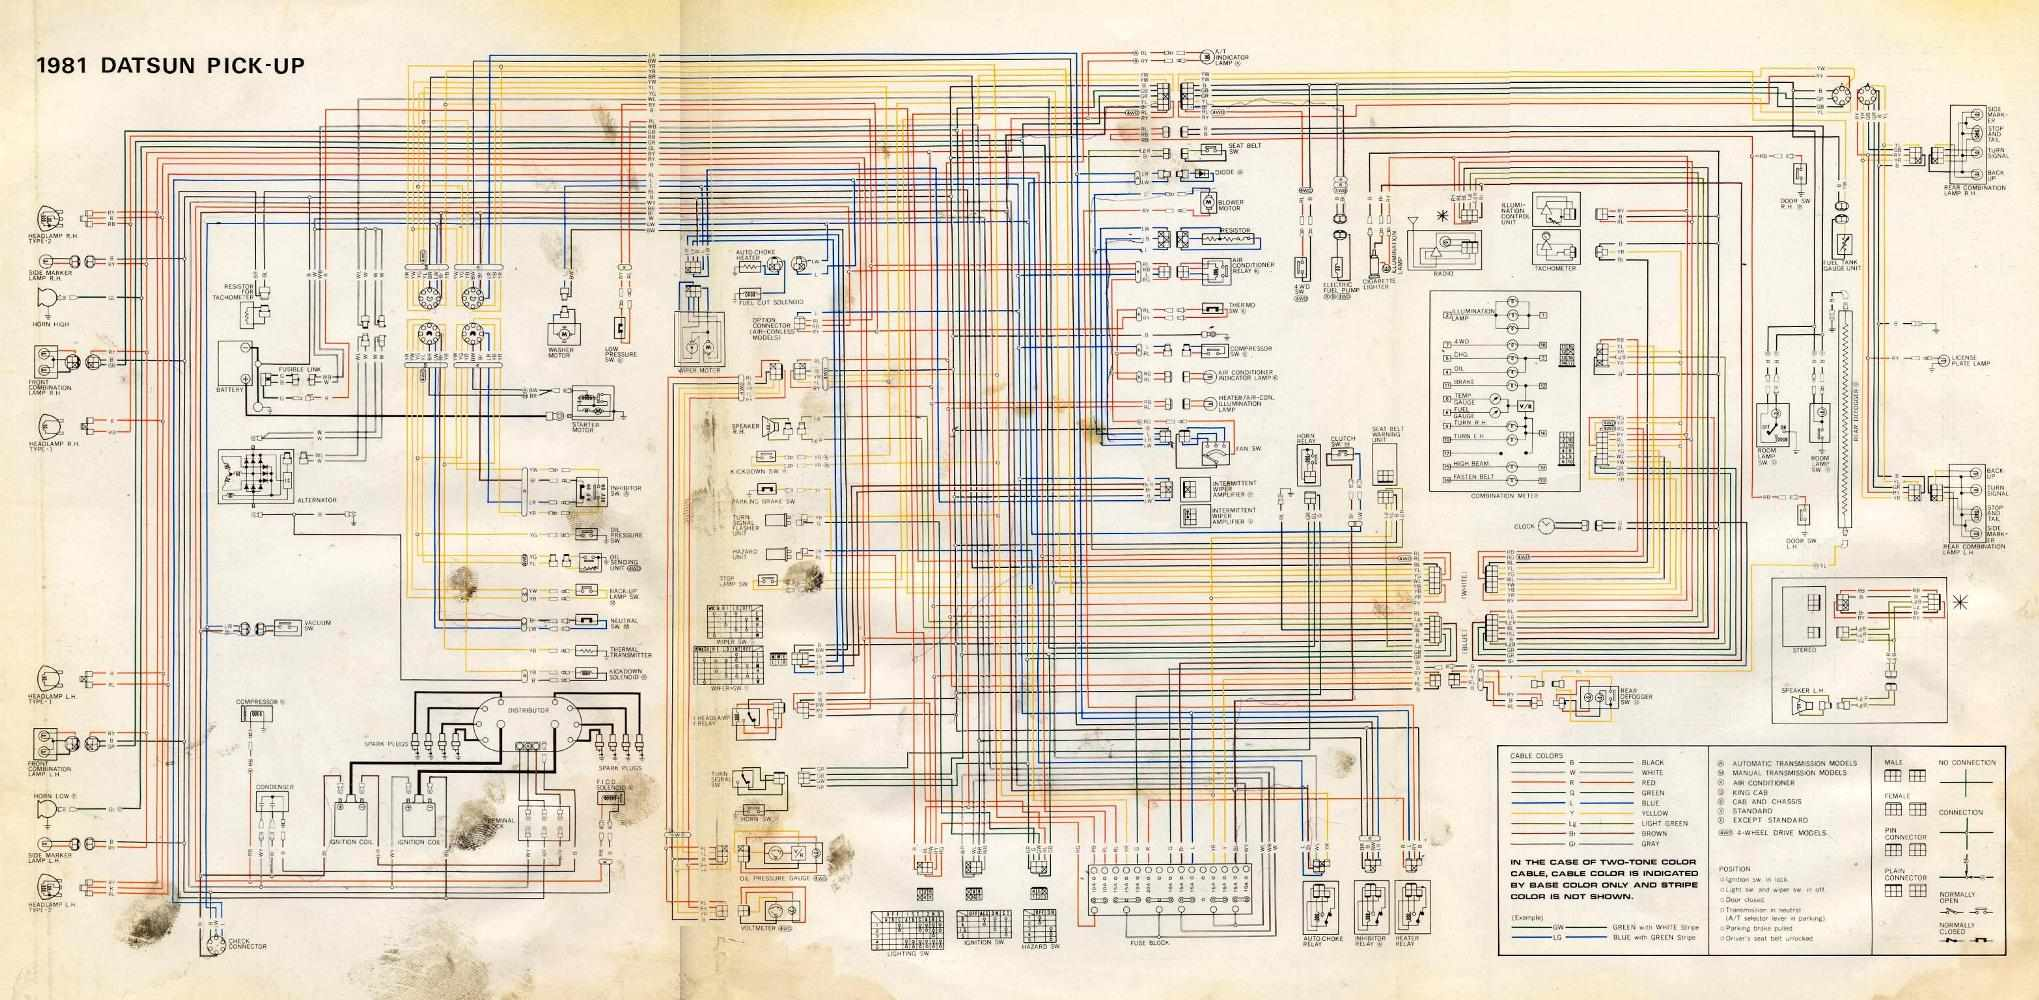 1987 Dodge Dakota Fuse Box Wiper Wiring Diagram Schematics 1978 C10 For Electrical Diagrams Ram 1500